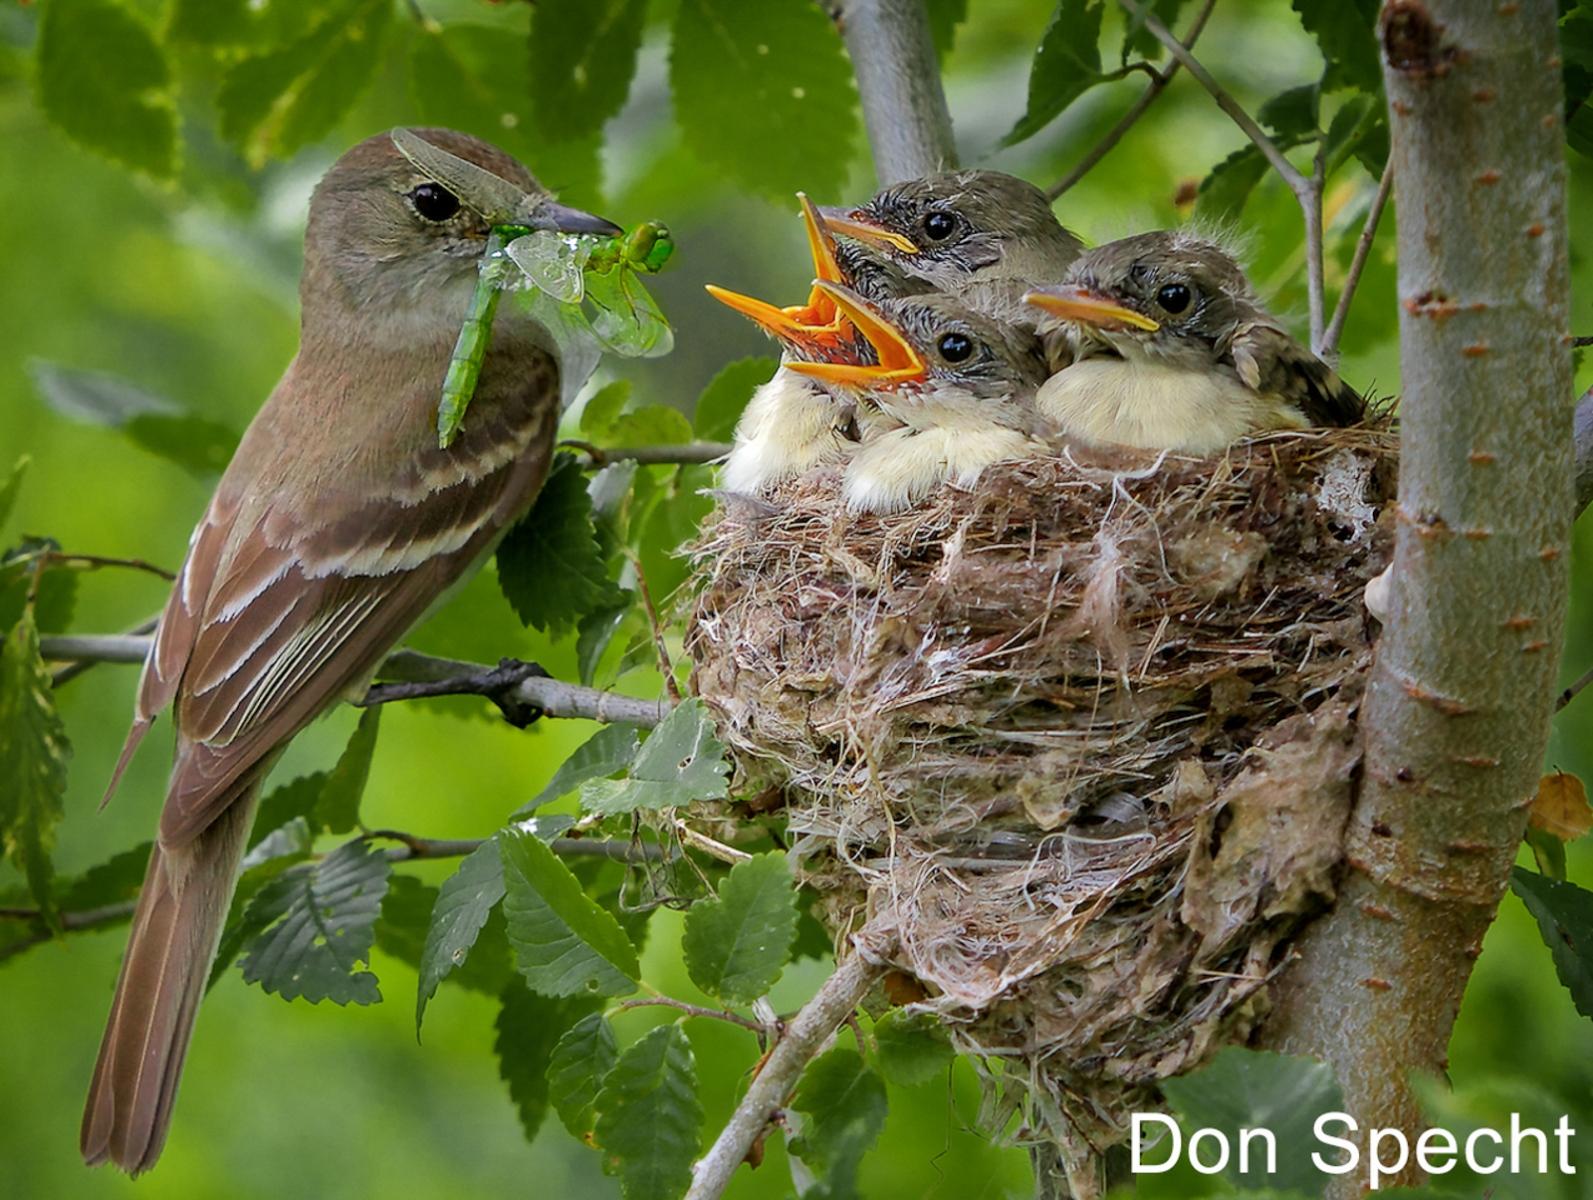 W3-17.Willow-Flycatcher-Feeding-Nestlings